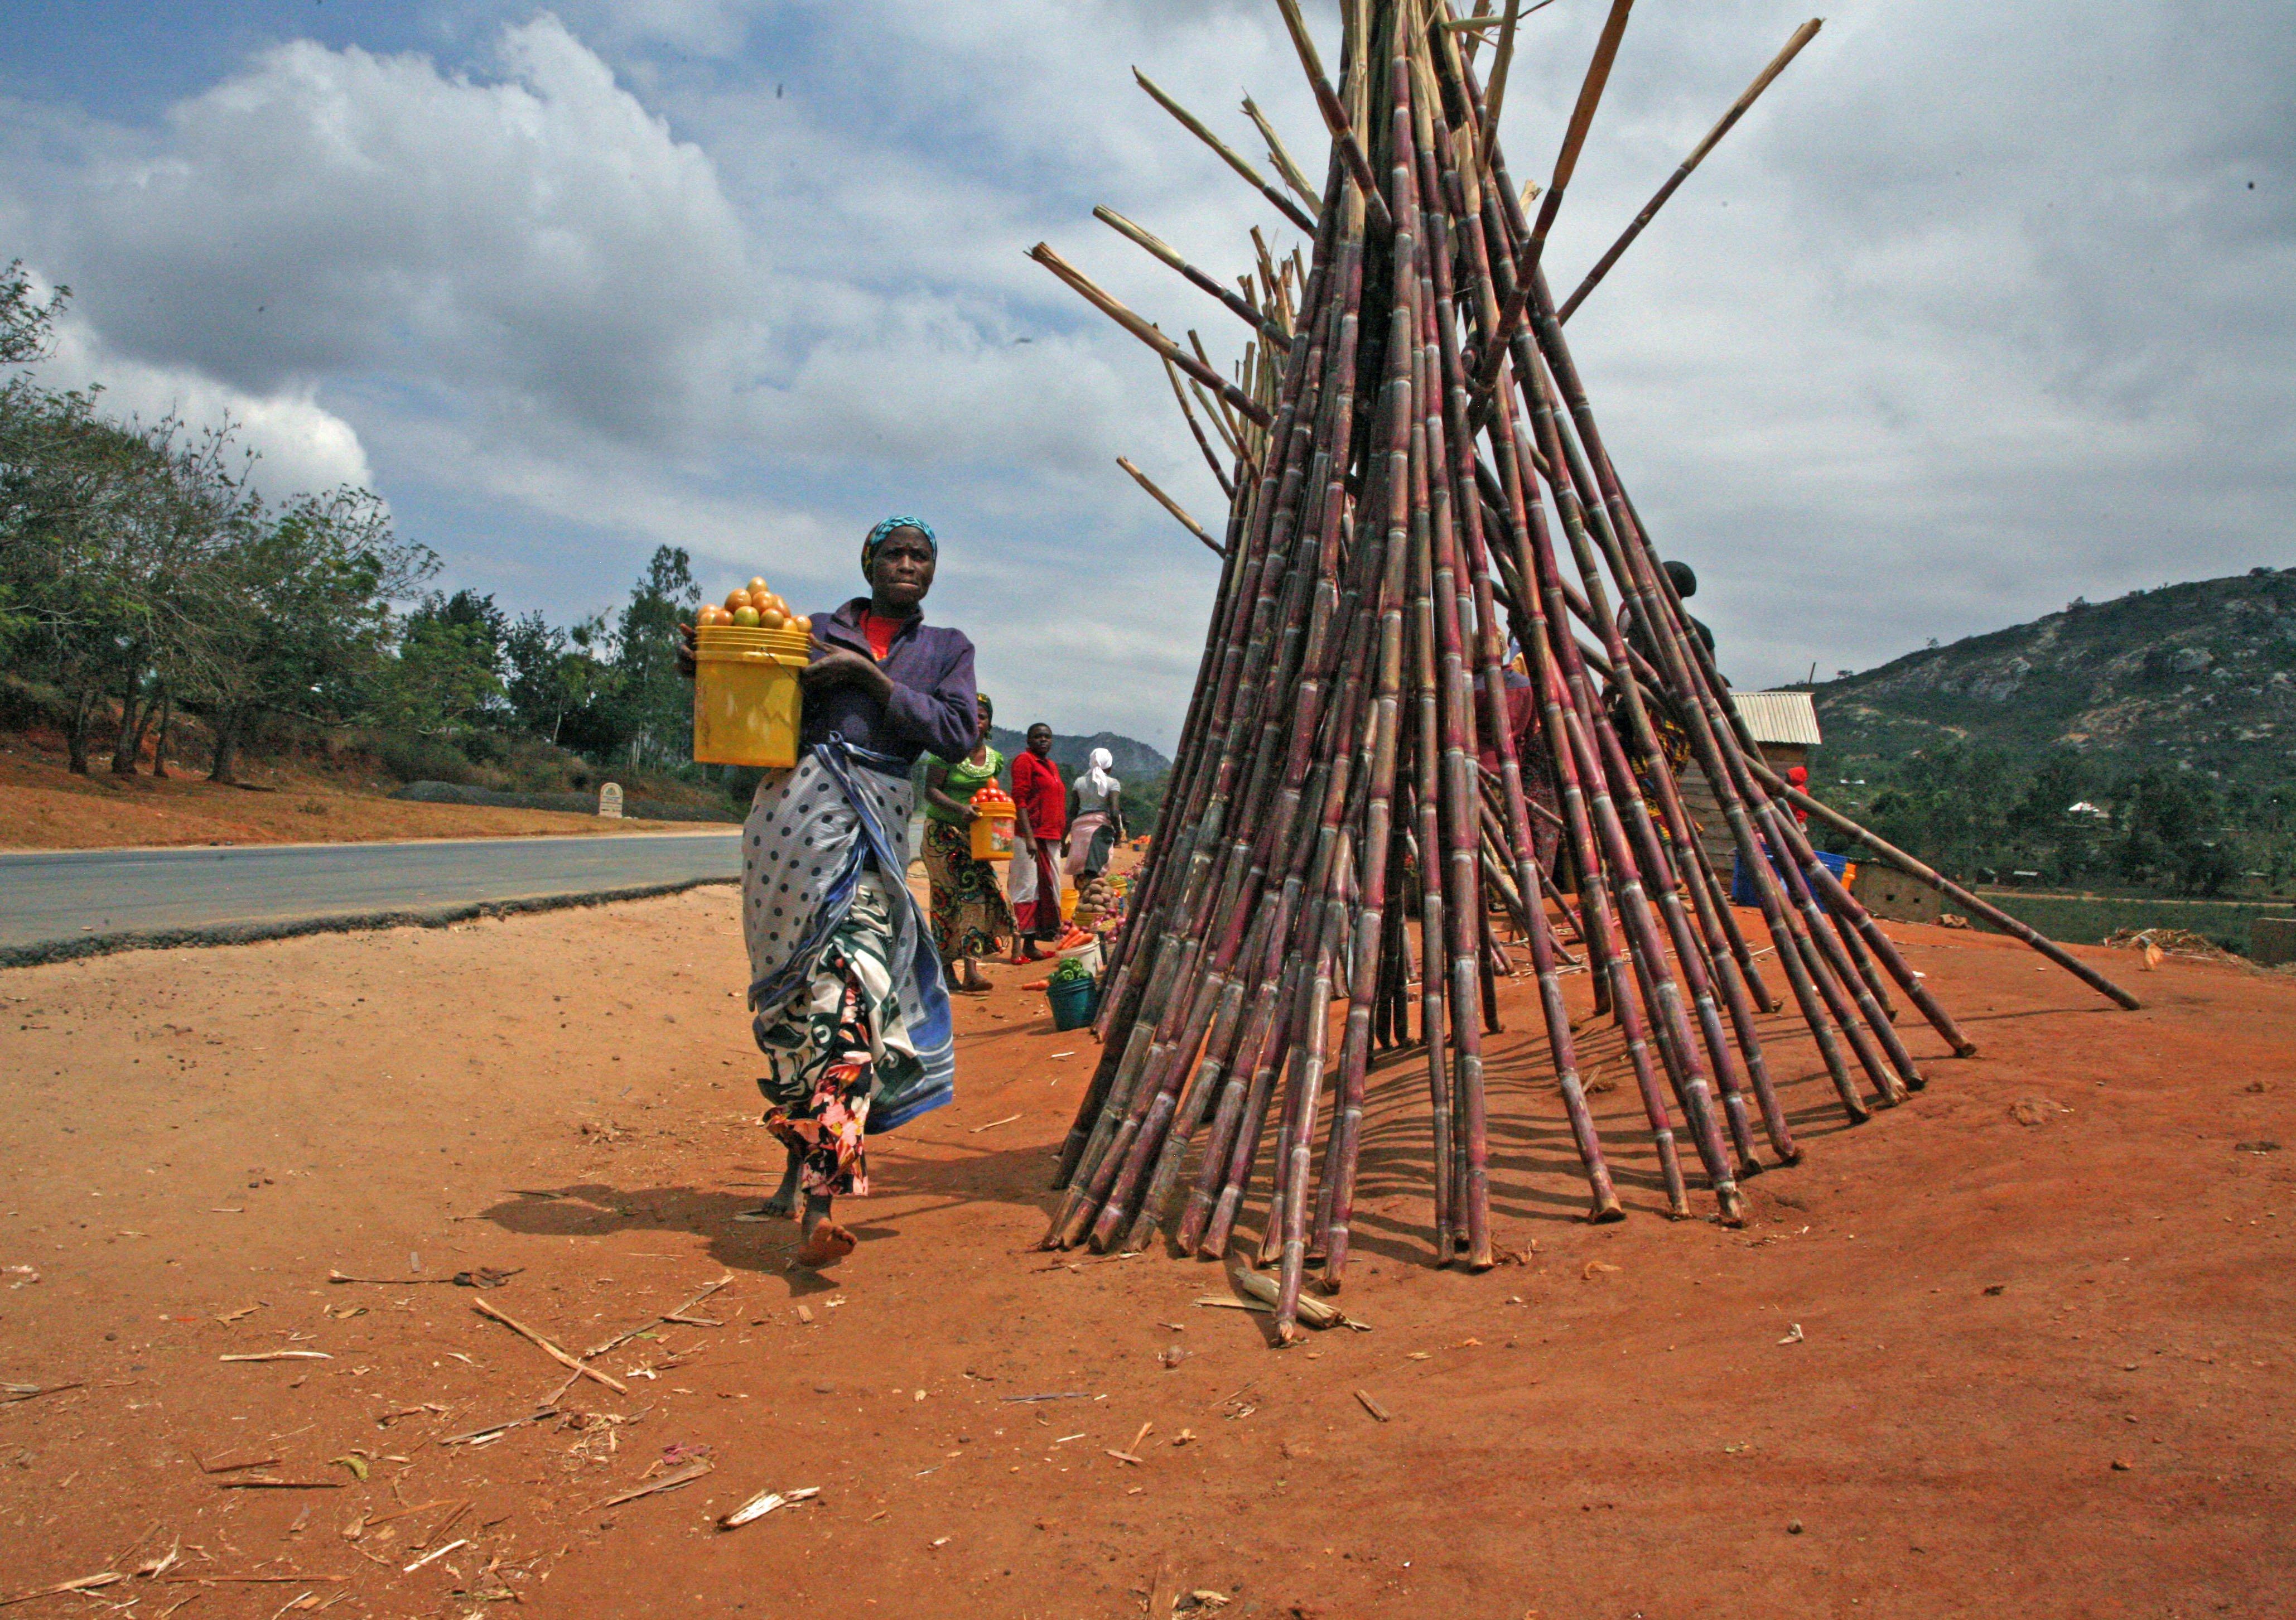 Woman selling sugar cane in Morogoro, Tanzania. Photo: PRISE/Rajeshree Sisodia